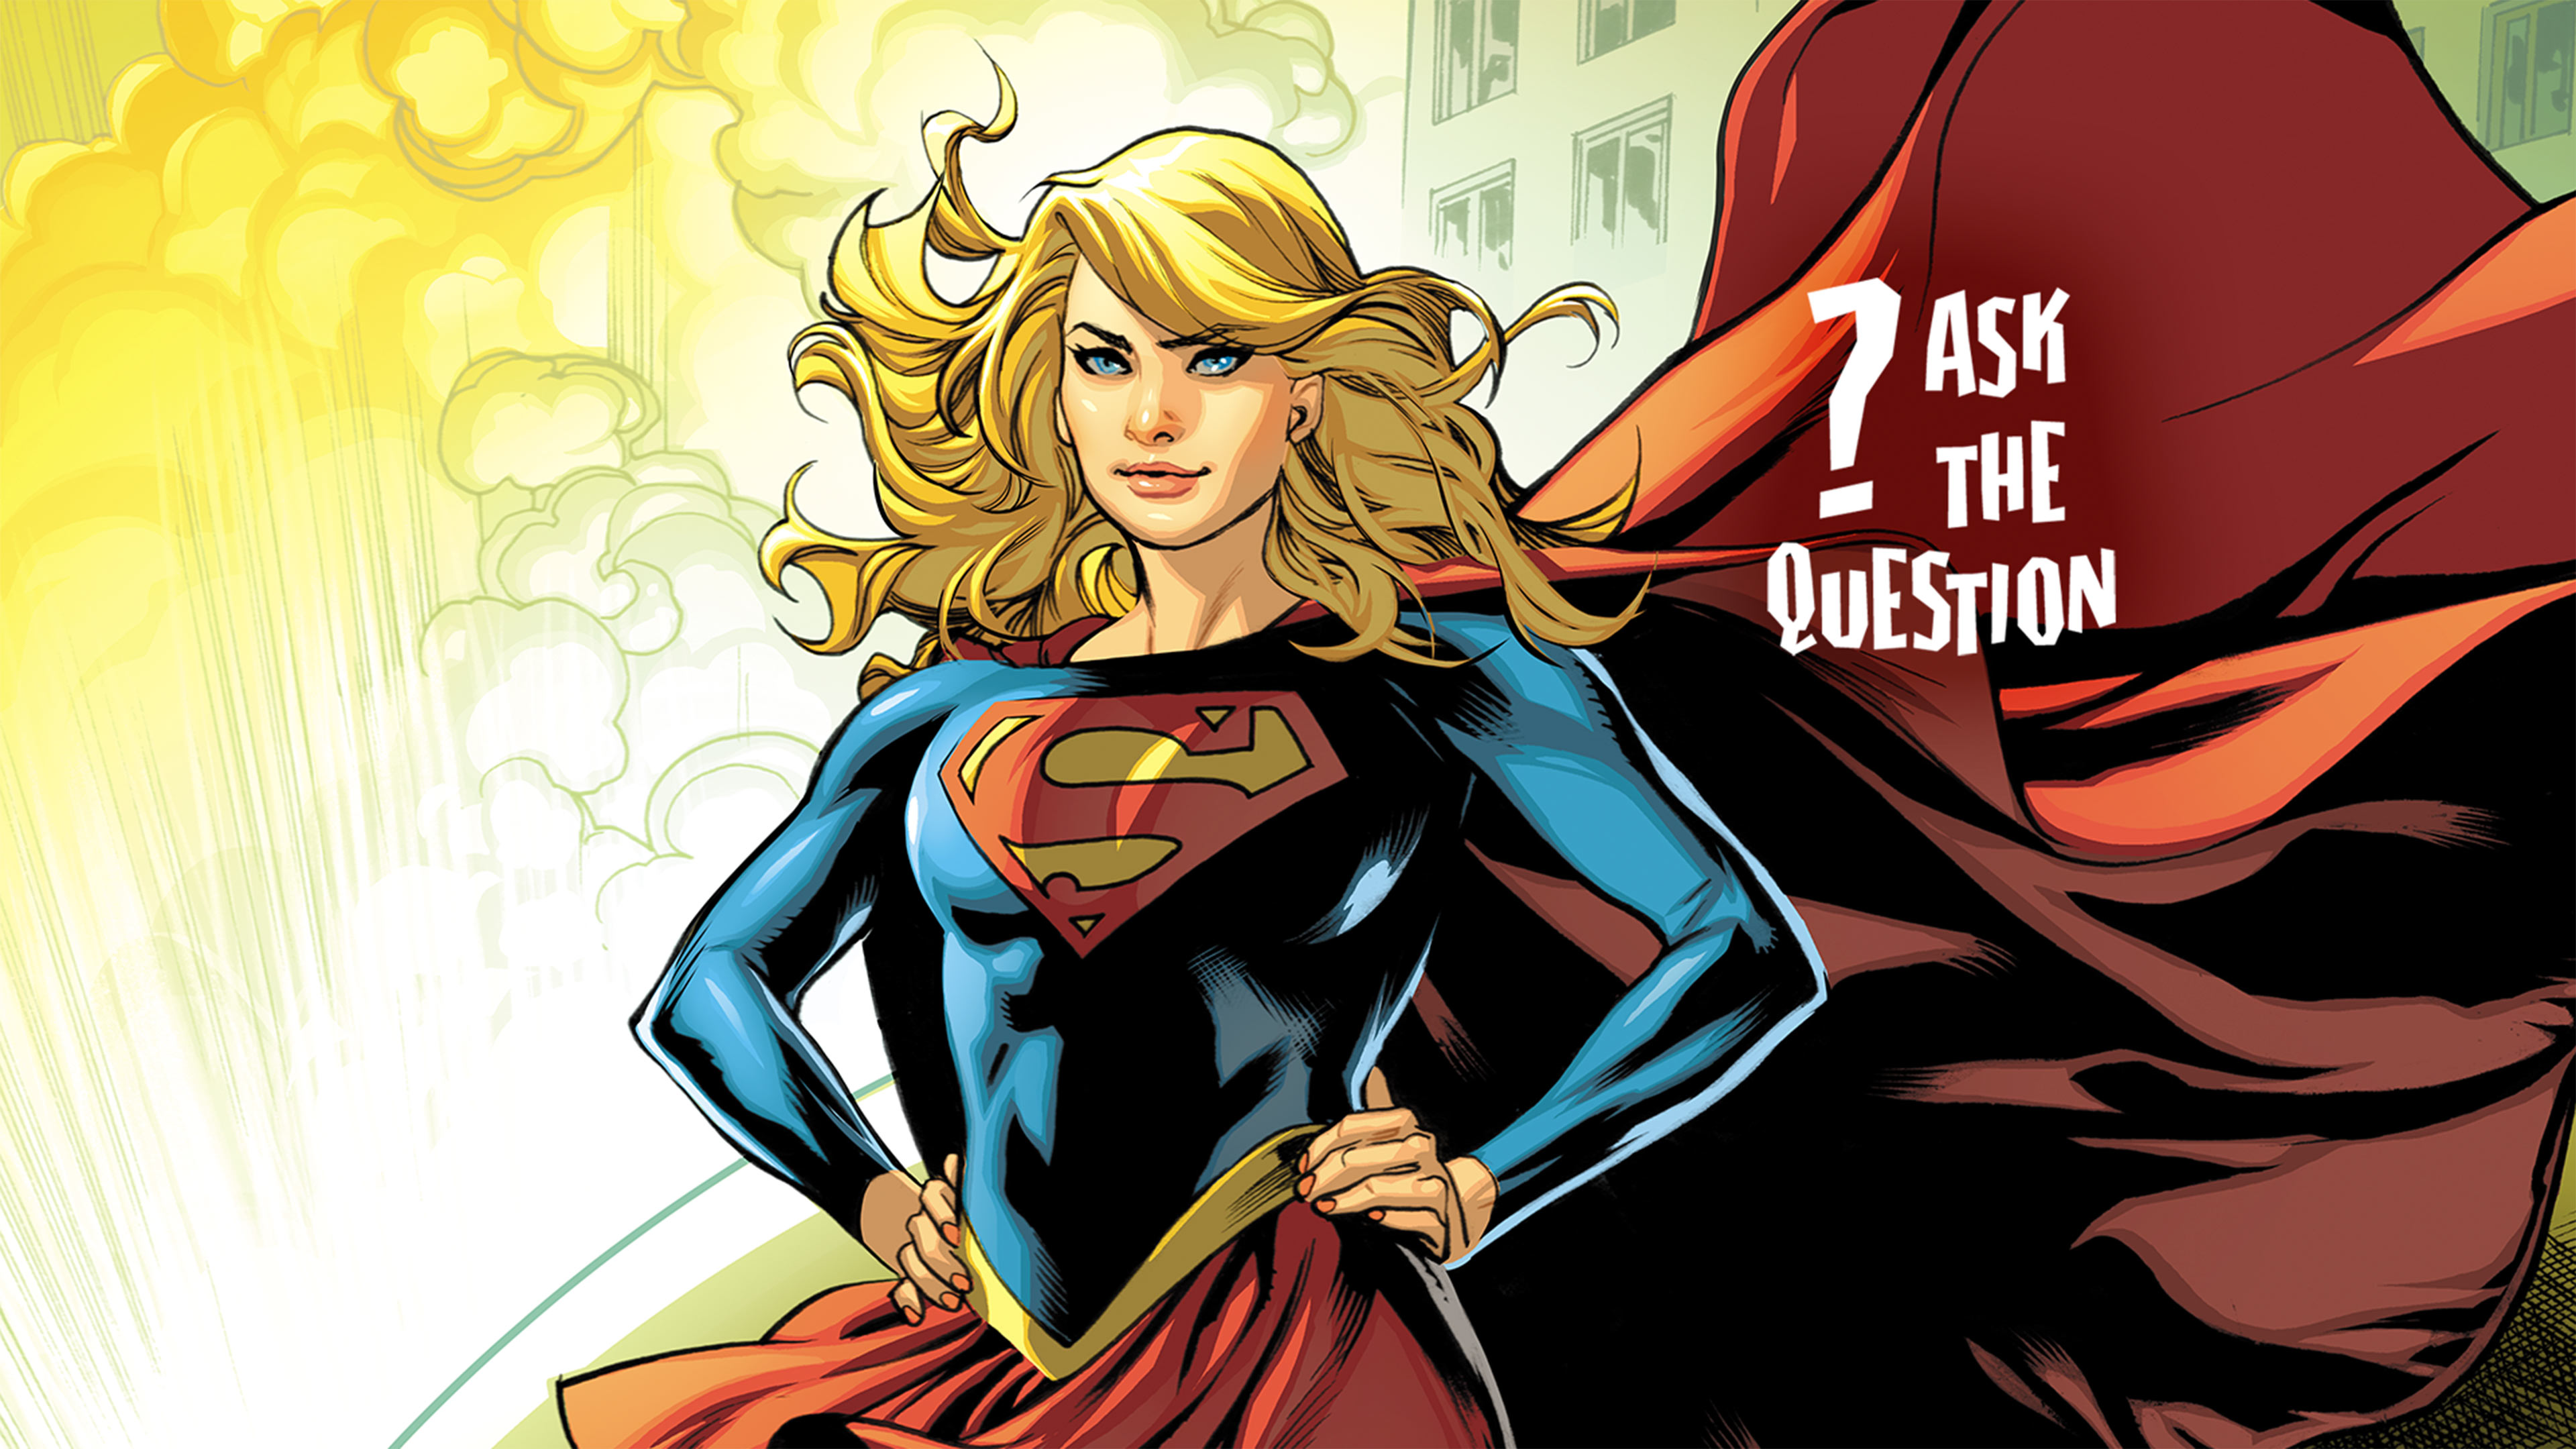 atq_supergirl_news_hero-c_v1_200429.jpg